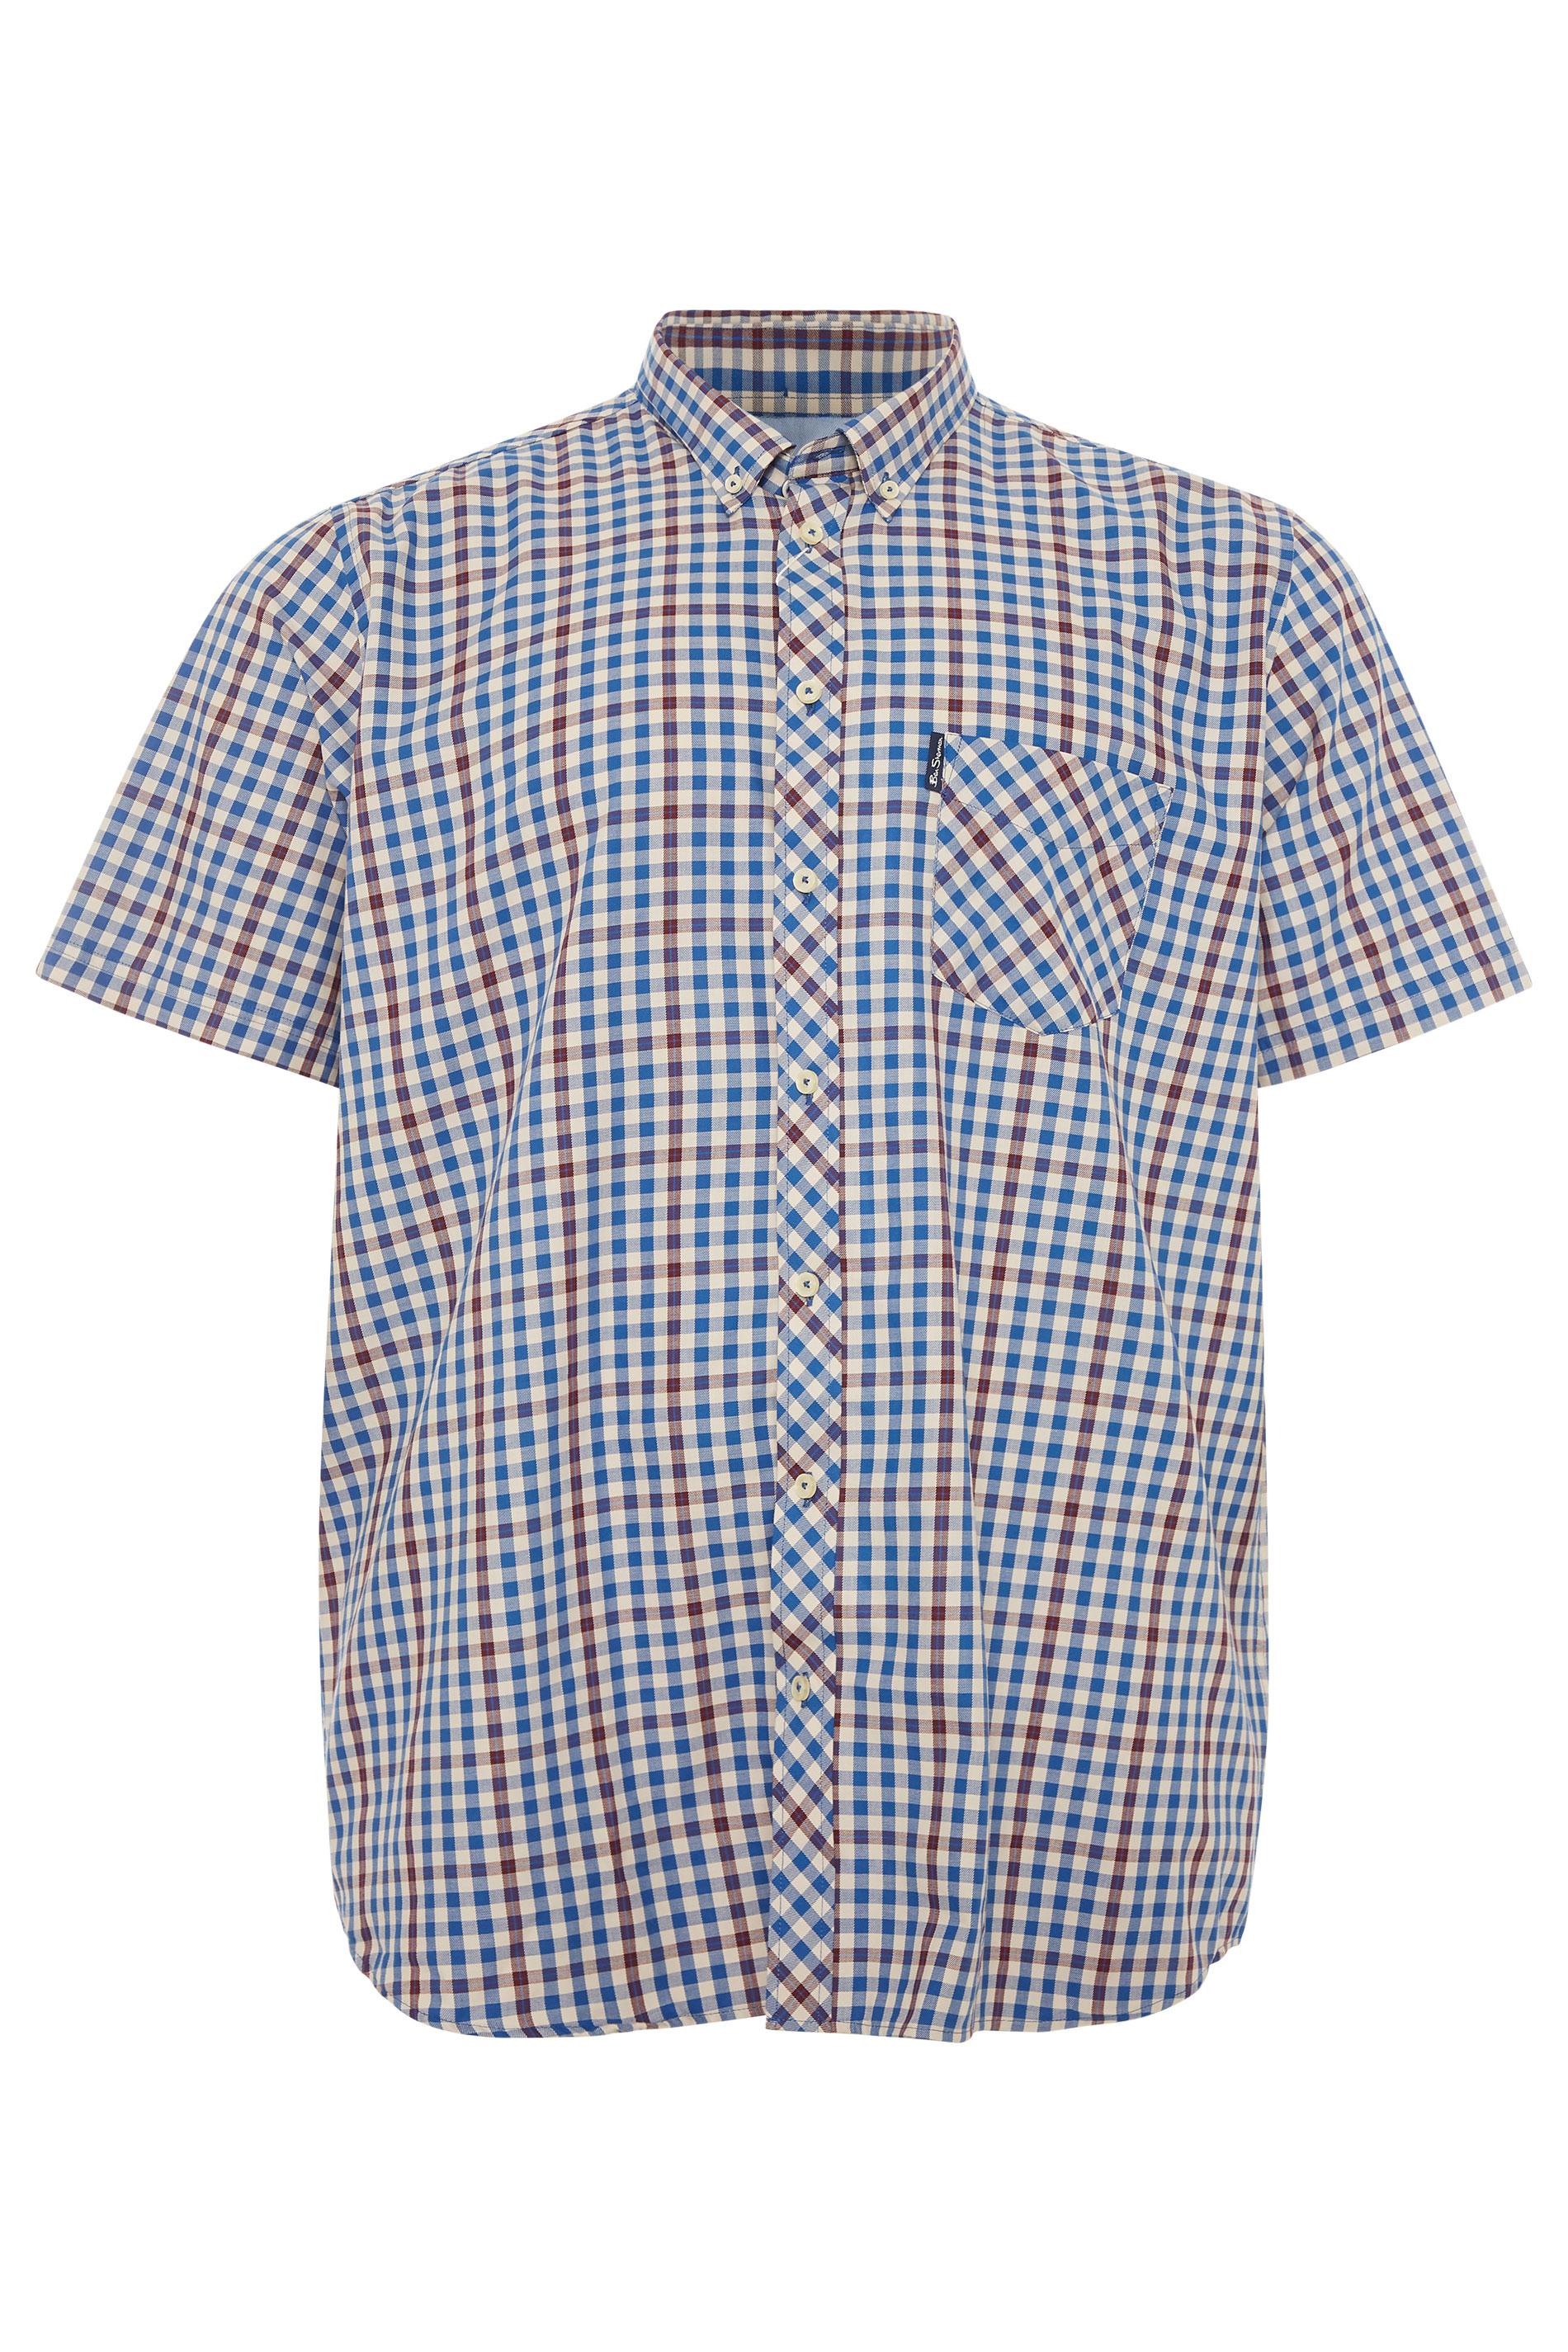 BEN SHERMAN Blue Check Short Sleeve Shirt